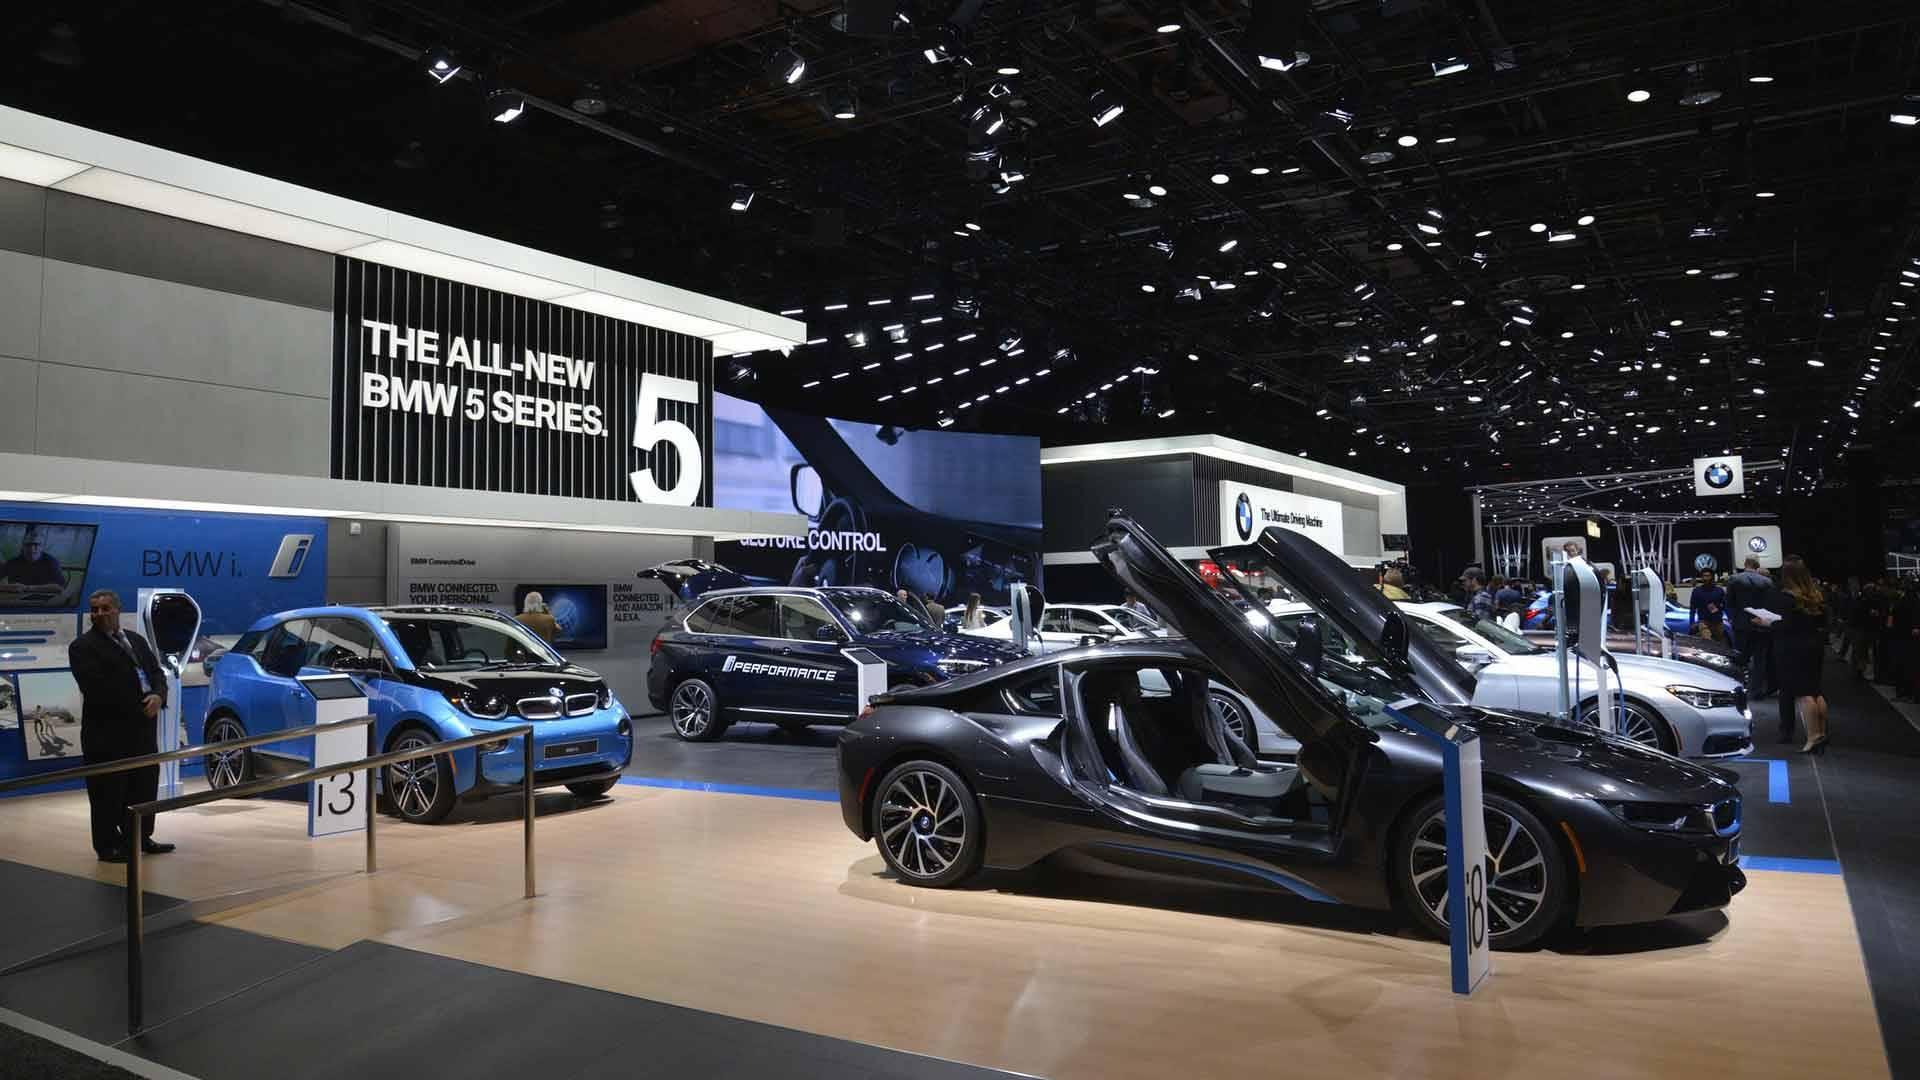 BMW Will Not Attend Detroit Auto Show - Autoshow